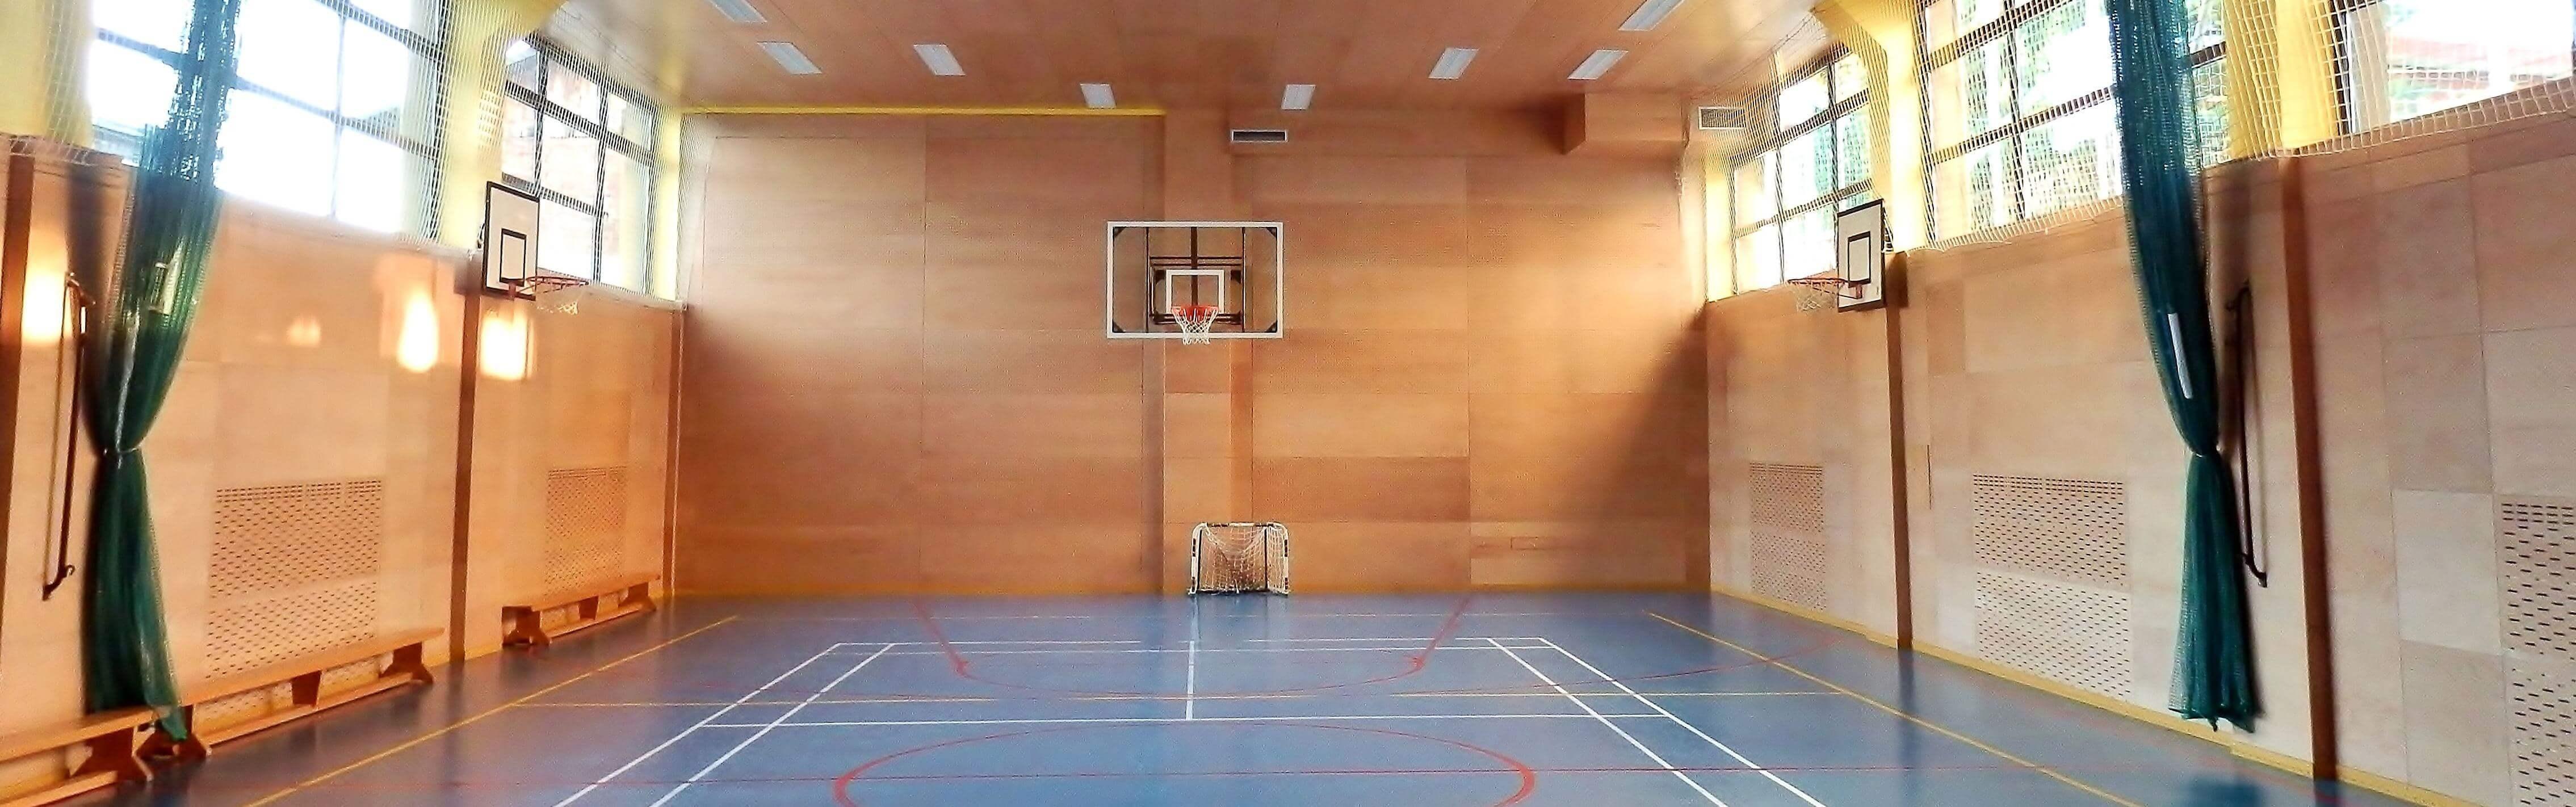 ALPIN športna oprema 1